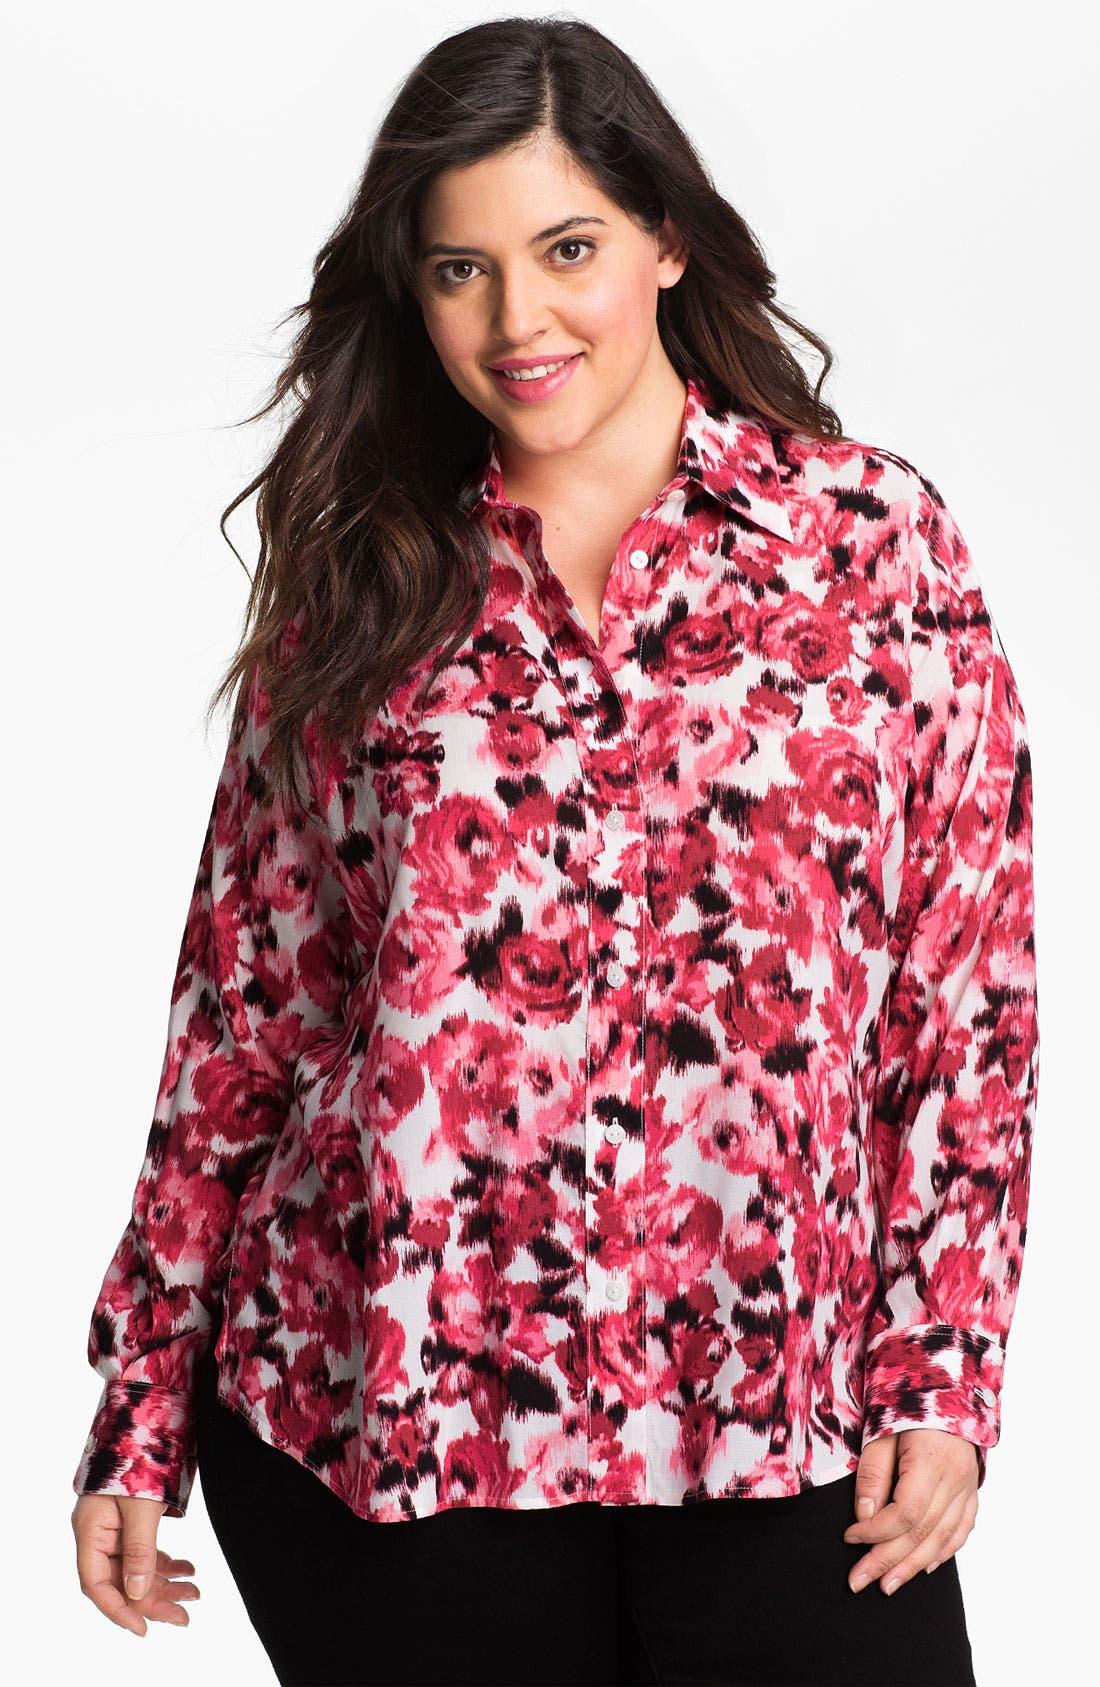 Alternate Image 1 Selected - Foxcroft Rose Print Shirt (Plus Size)